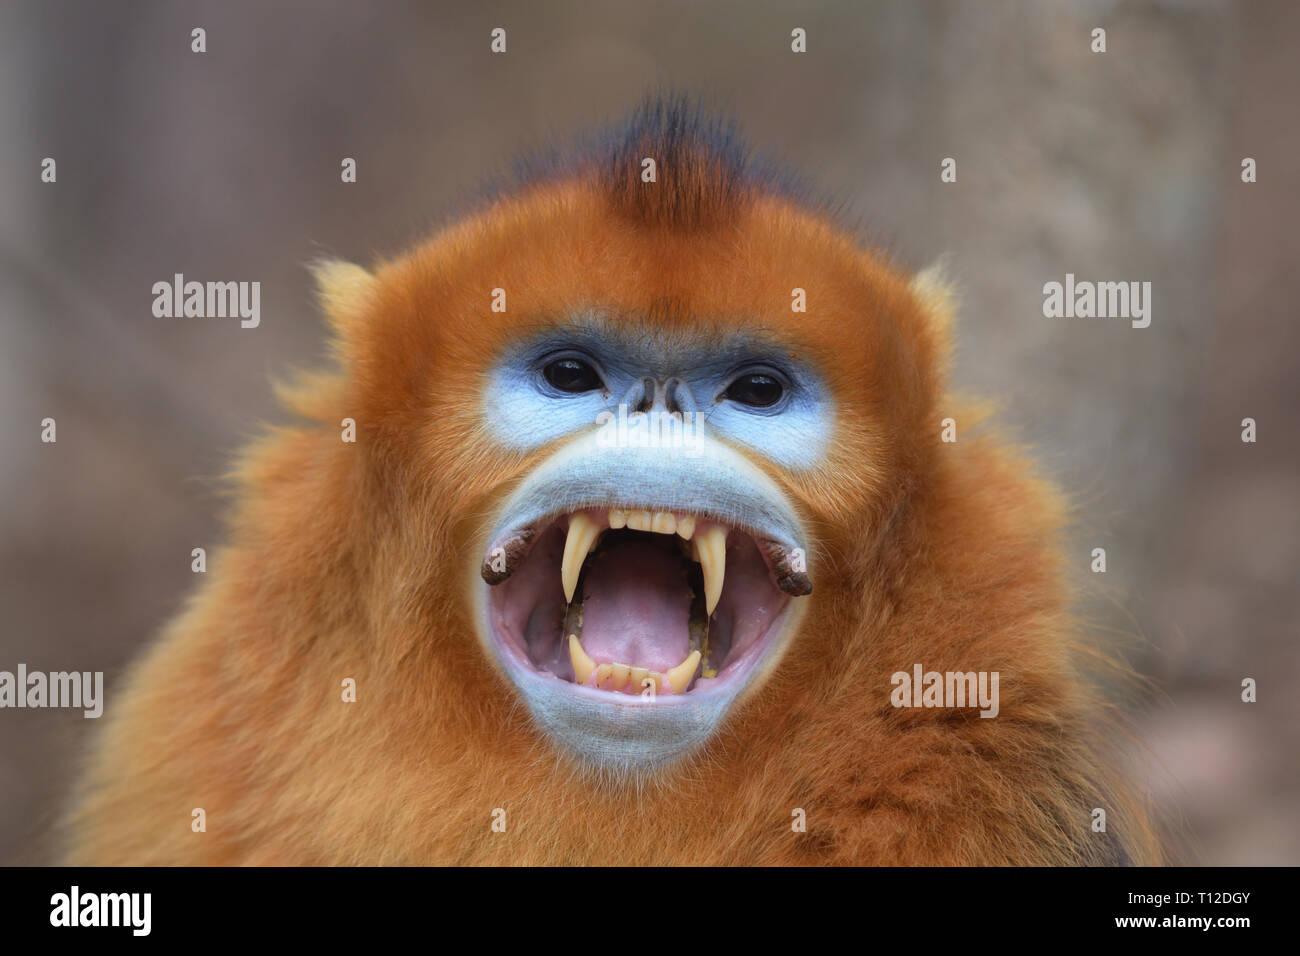 Golden Snub-nosed Monkey (Rhinopithecus roxellana) Adult male showing its fangs - Stock Image